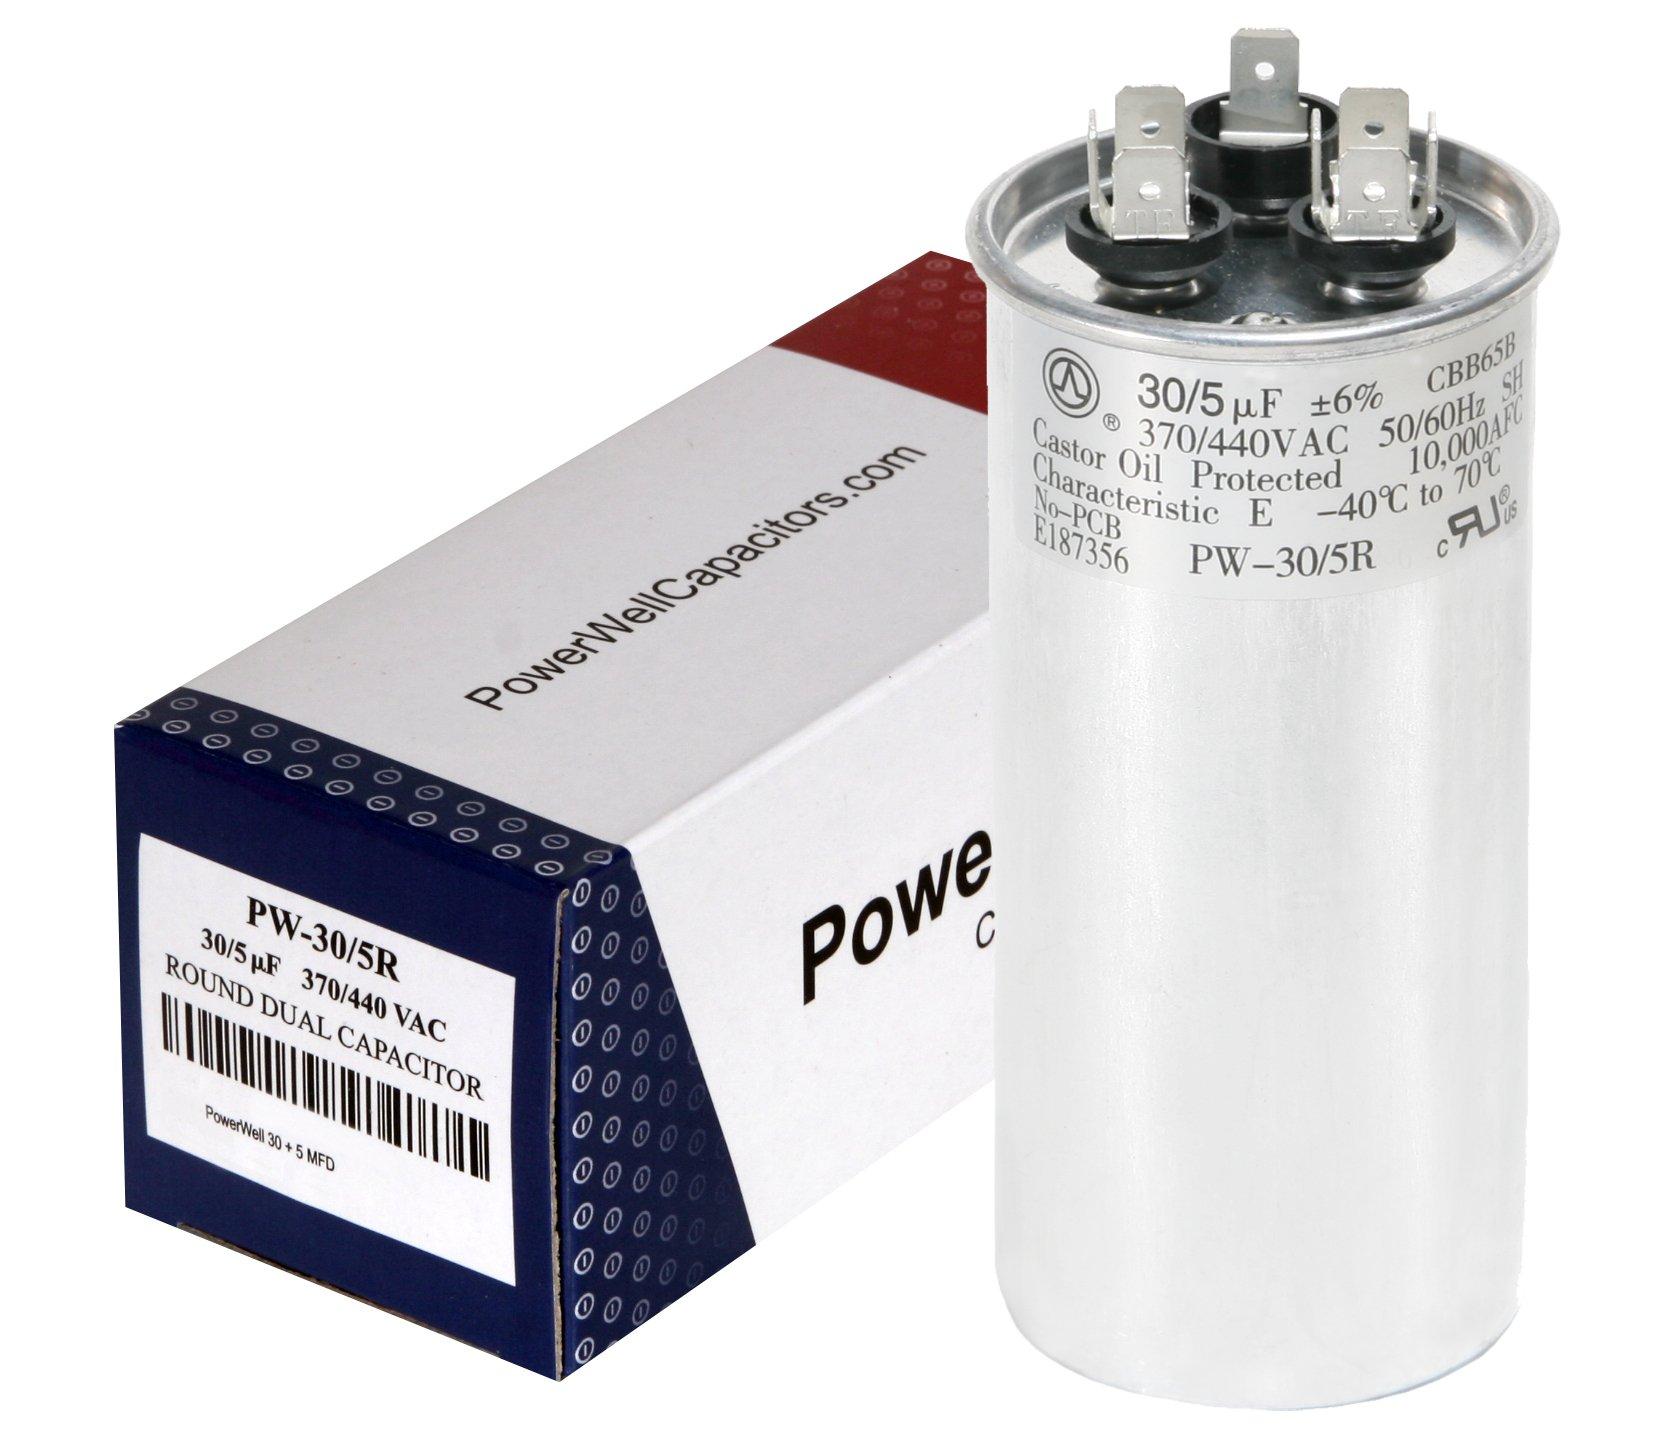 PowerWell 30 + 5 MFD uf 370 or 440 Volt Dual Run Round Capacitor Bundle PW-CAP-30/5/370-440R for Condenser Straight Cool or Heat Pump Air Conditioner